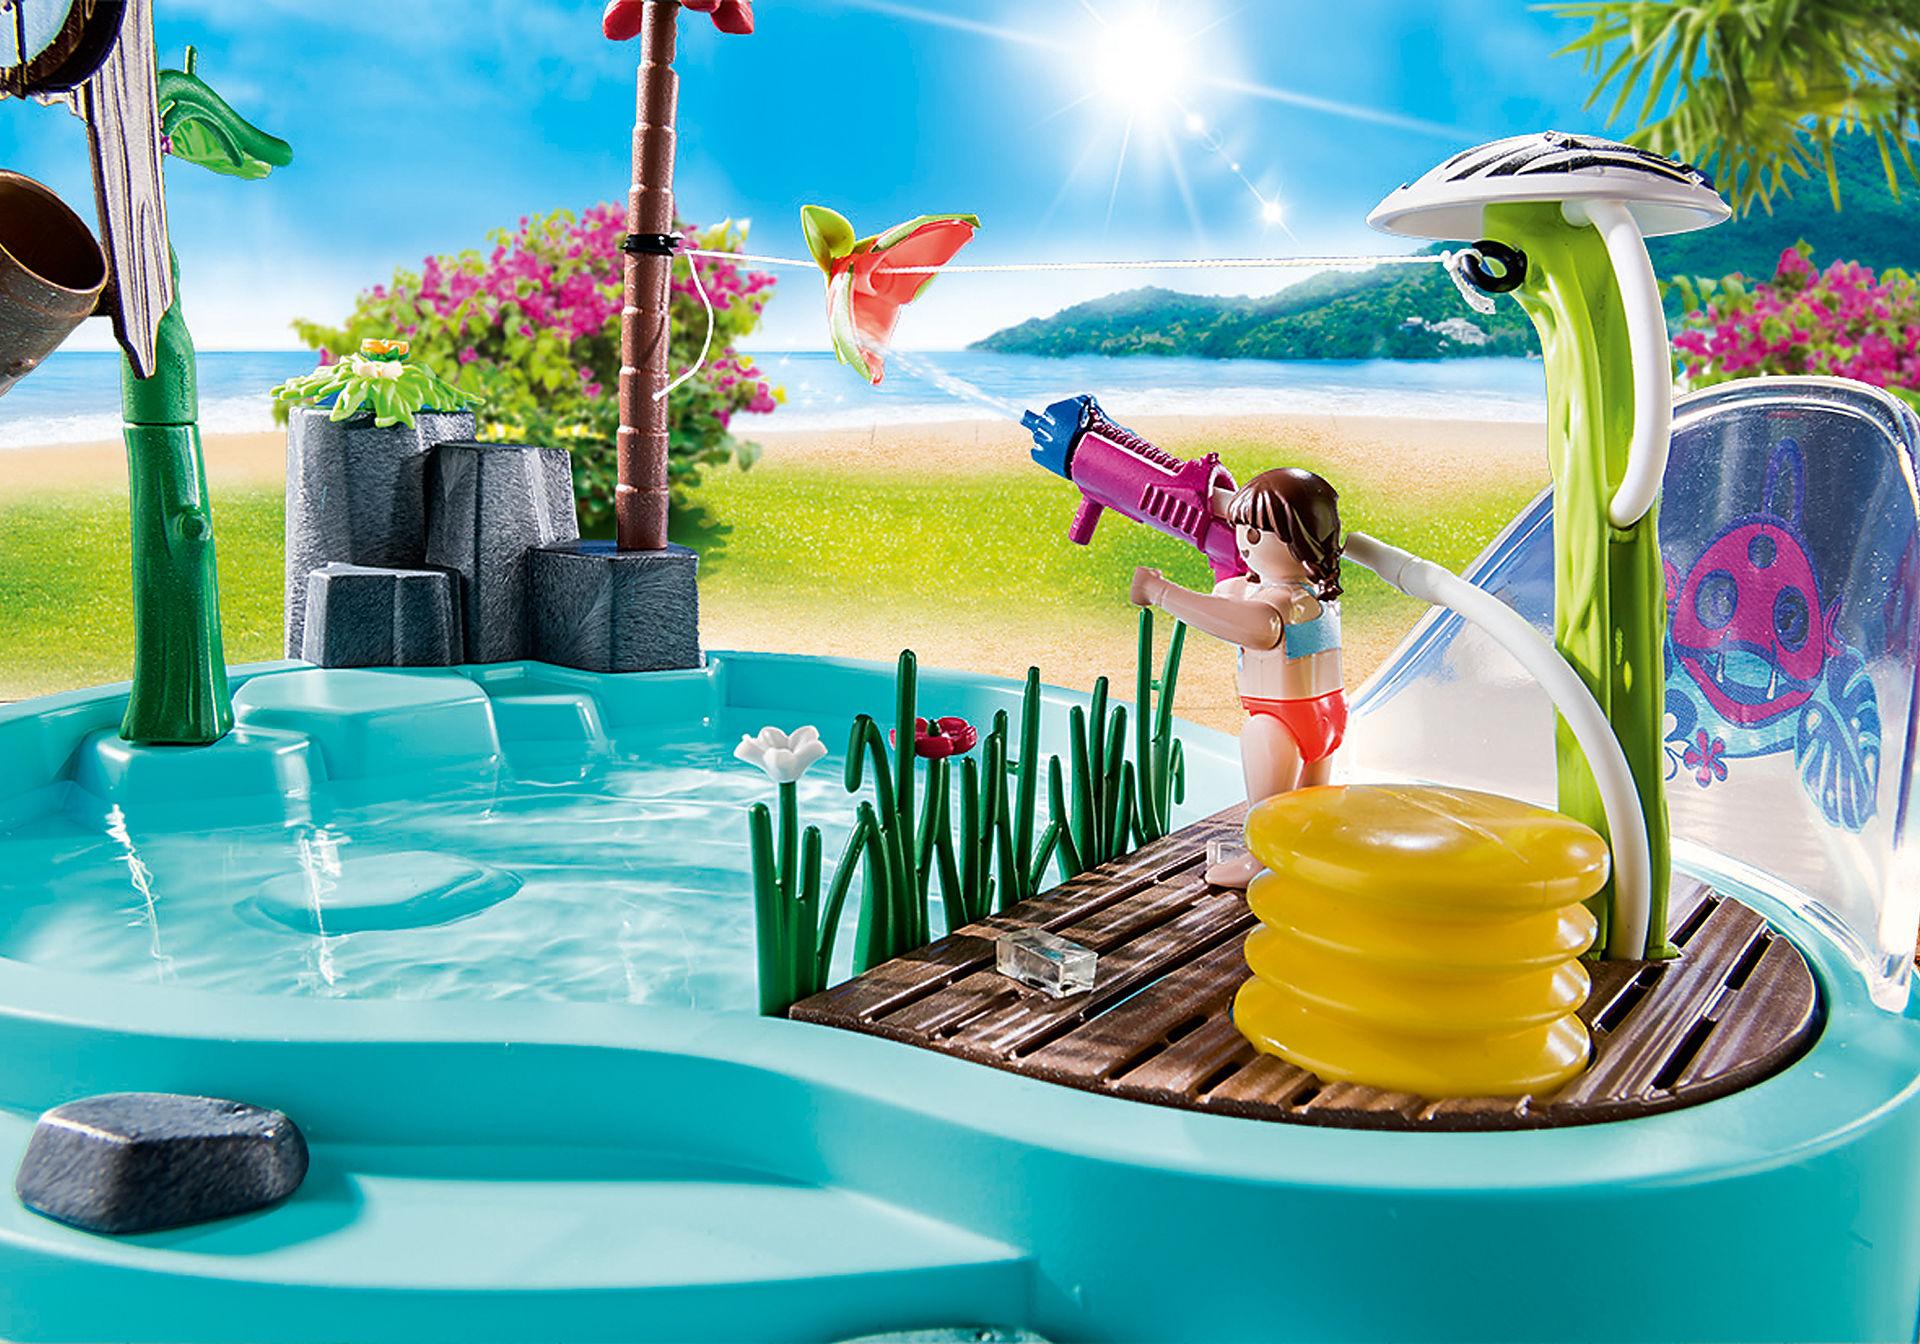 70610 Sjov pool med vandpistol zoom image4